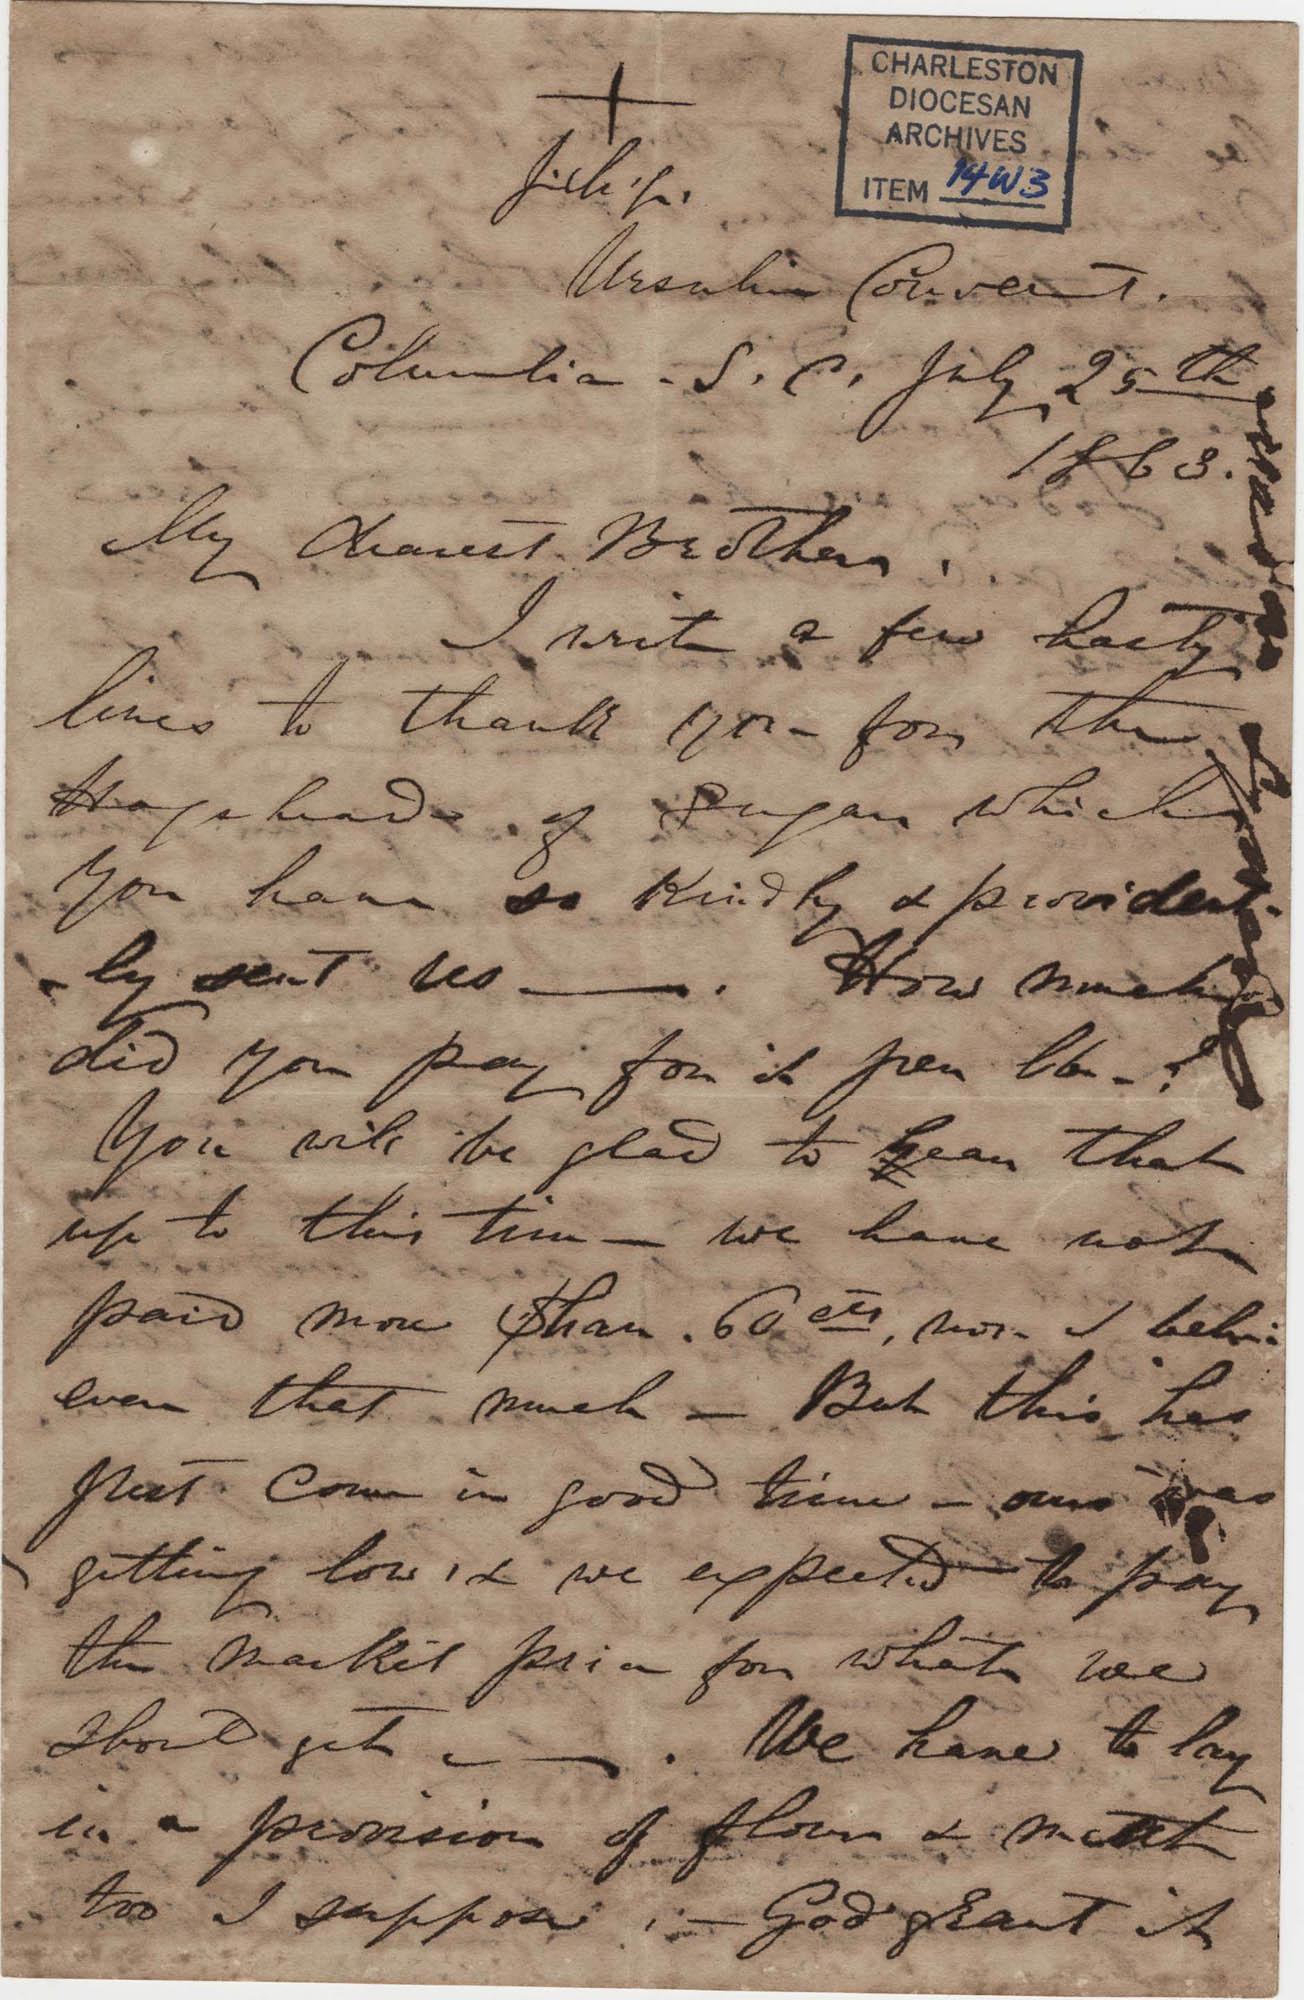 289. Madame Baptiste to Bp Patrick Lynch -- July 25, 1863